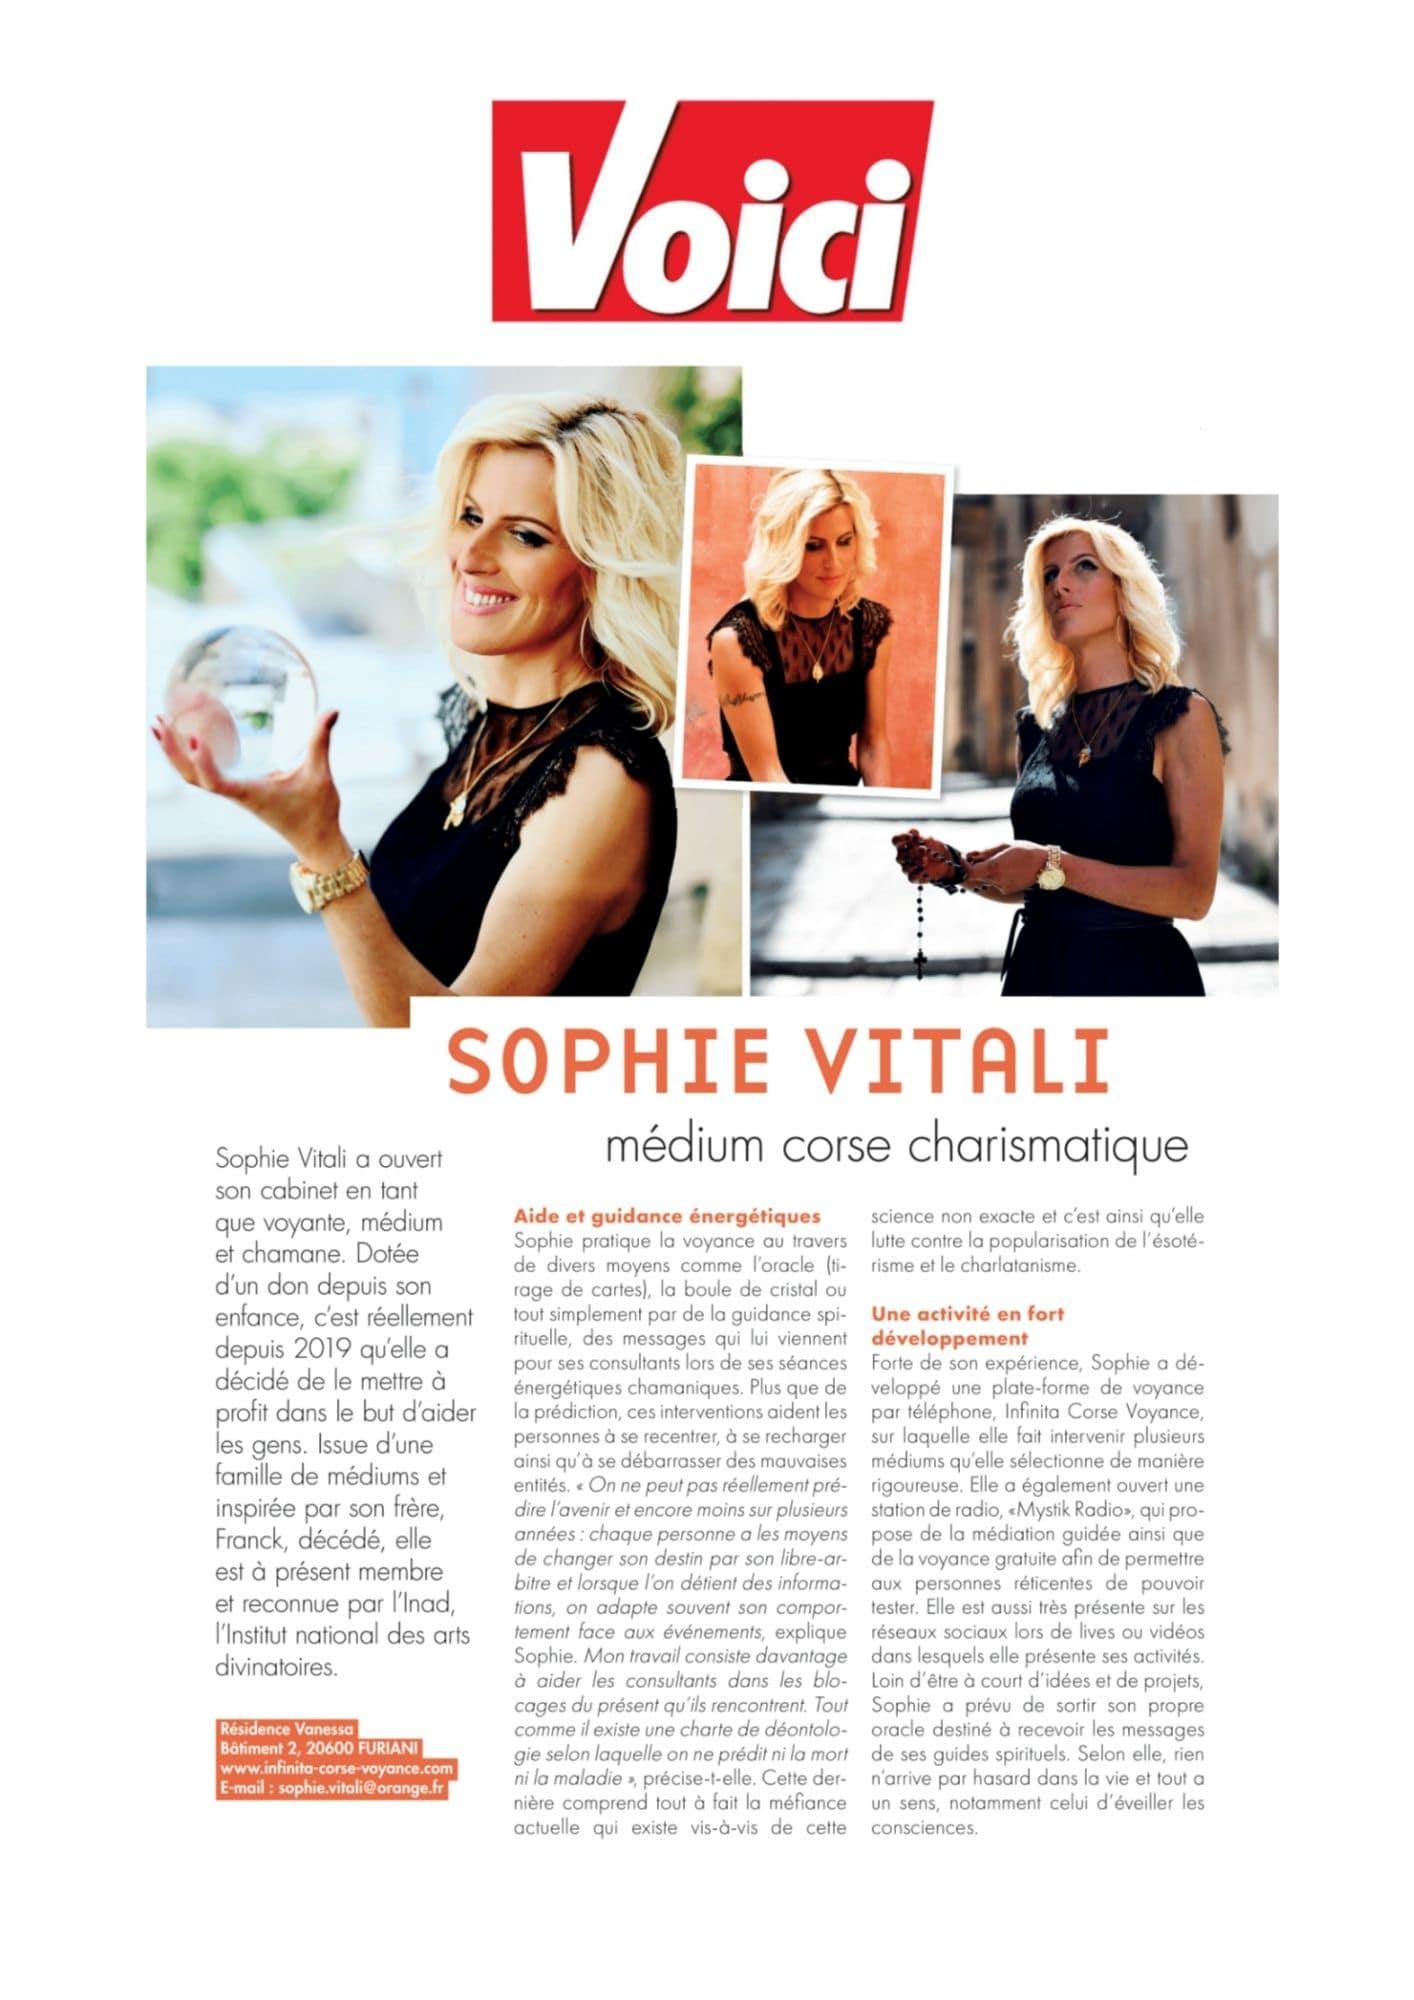 Voici magazine Sophie Vitali